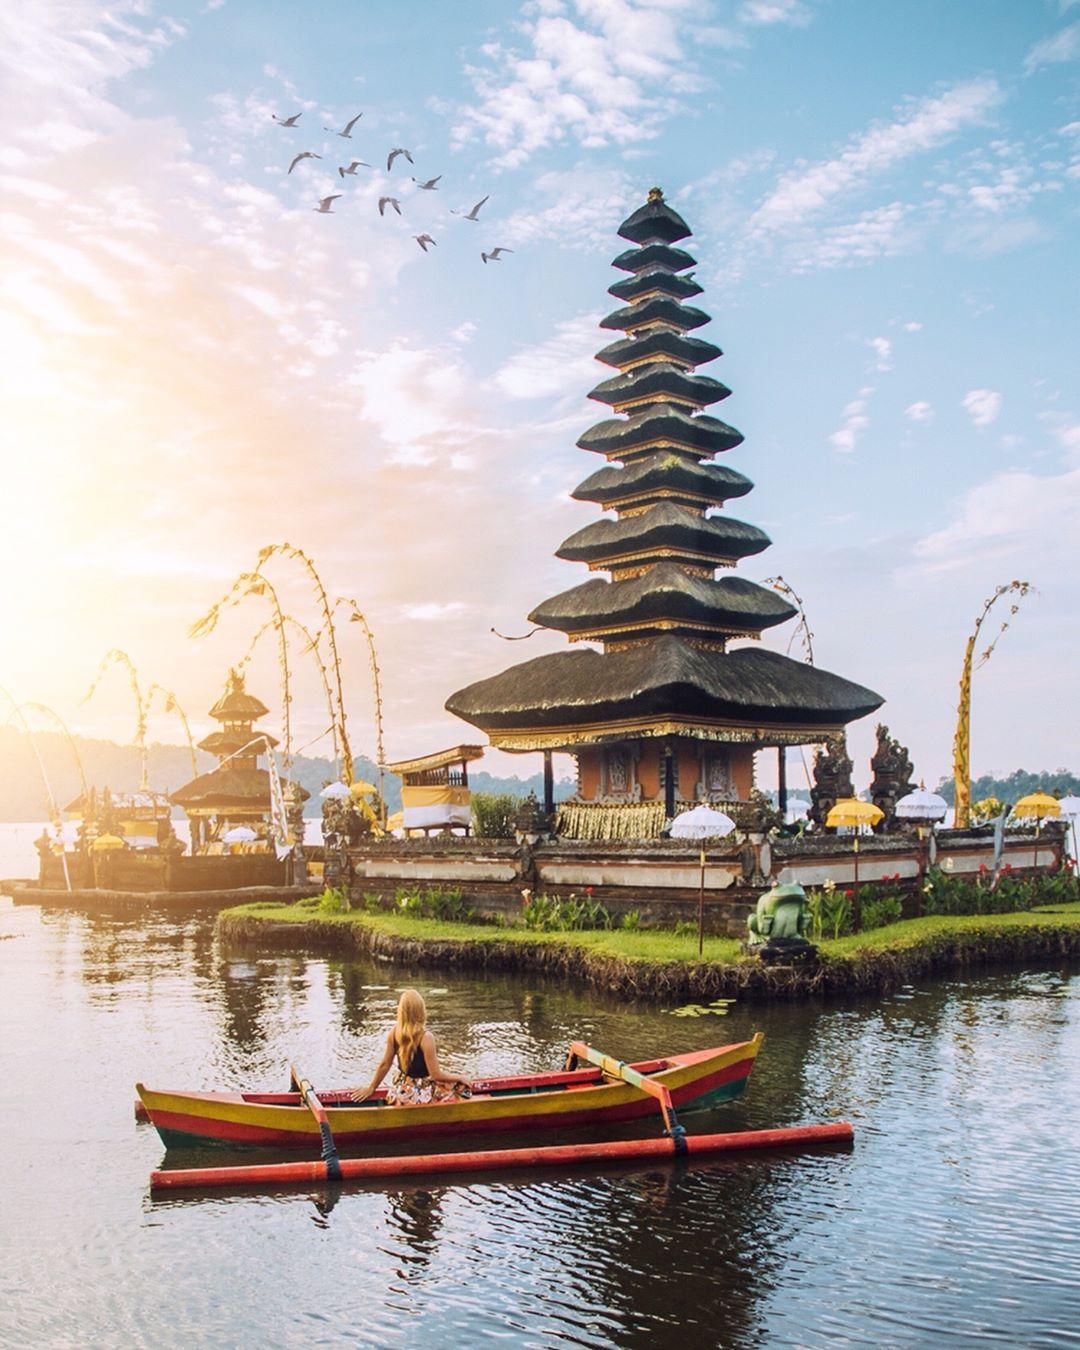 Sunset in Bali; Pura Ulun Danu